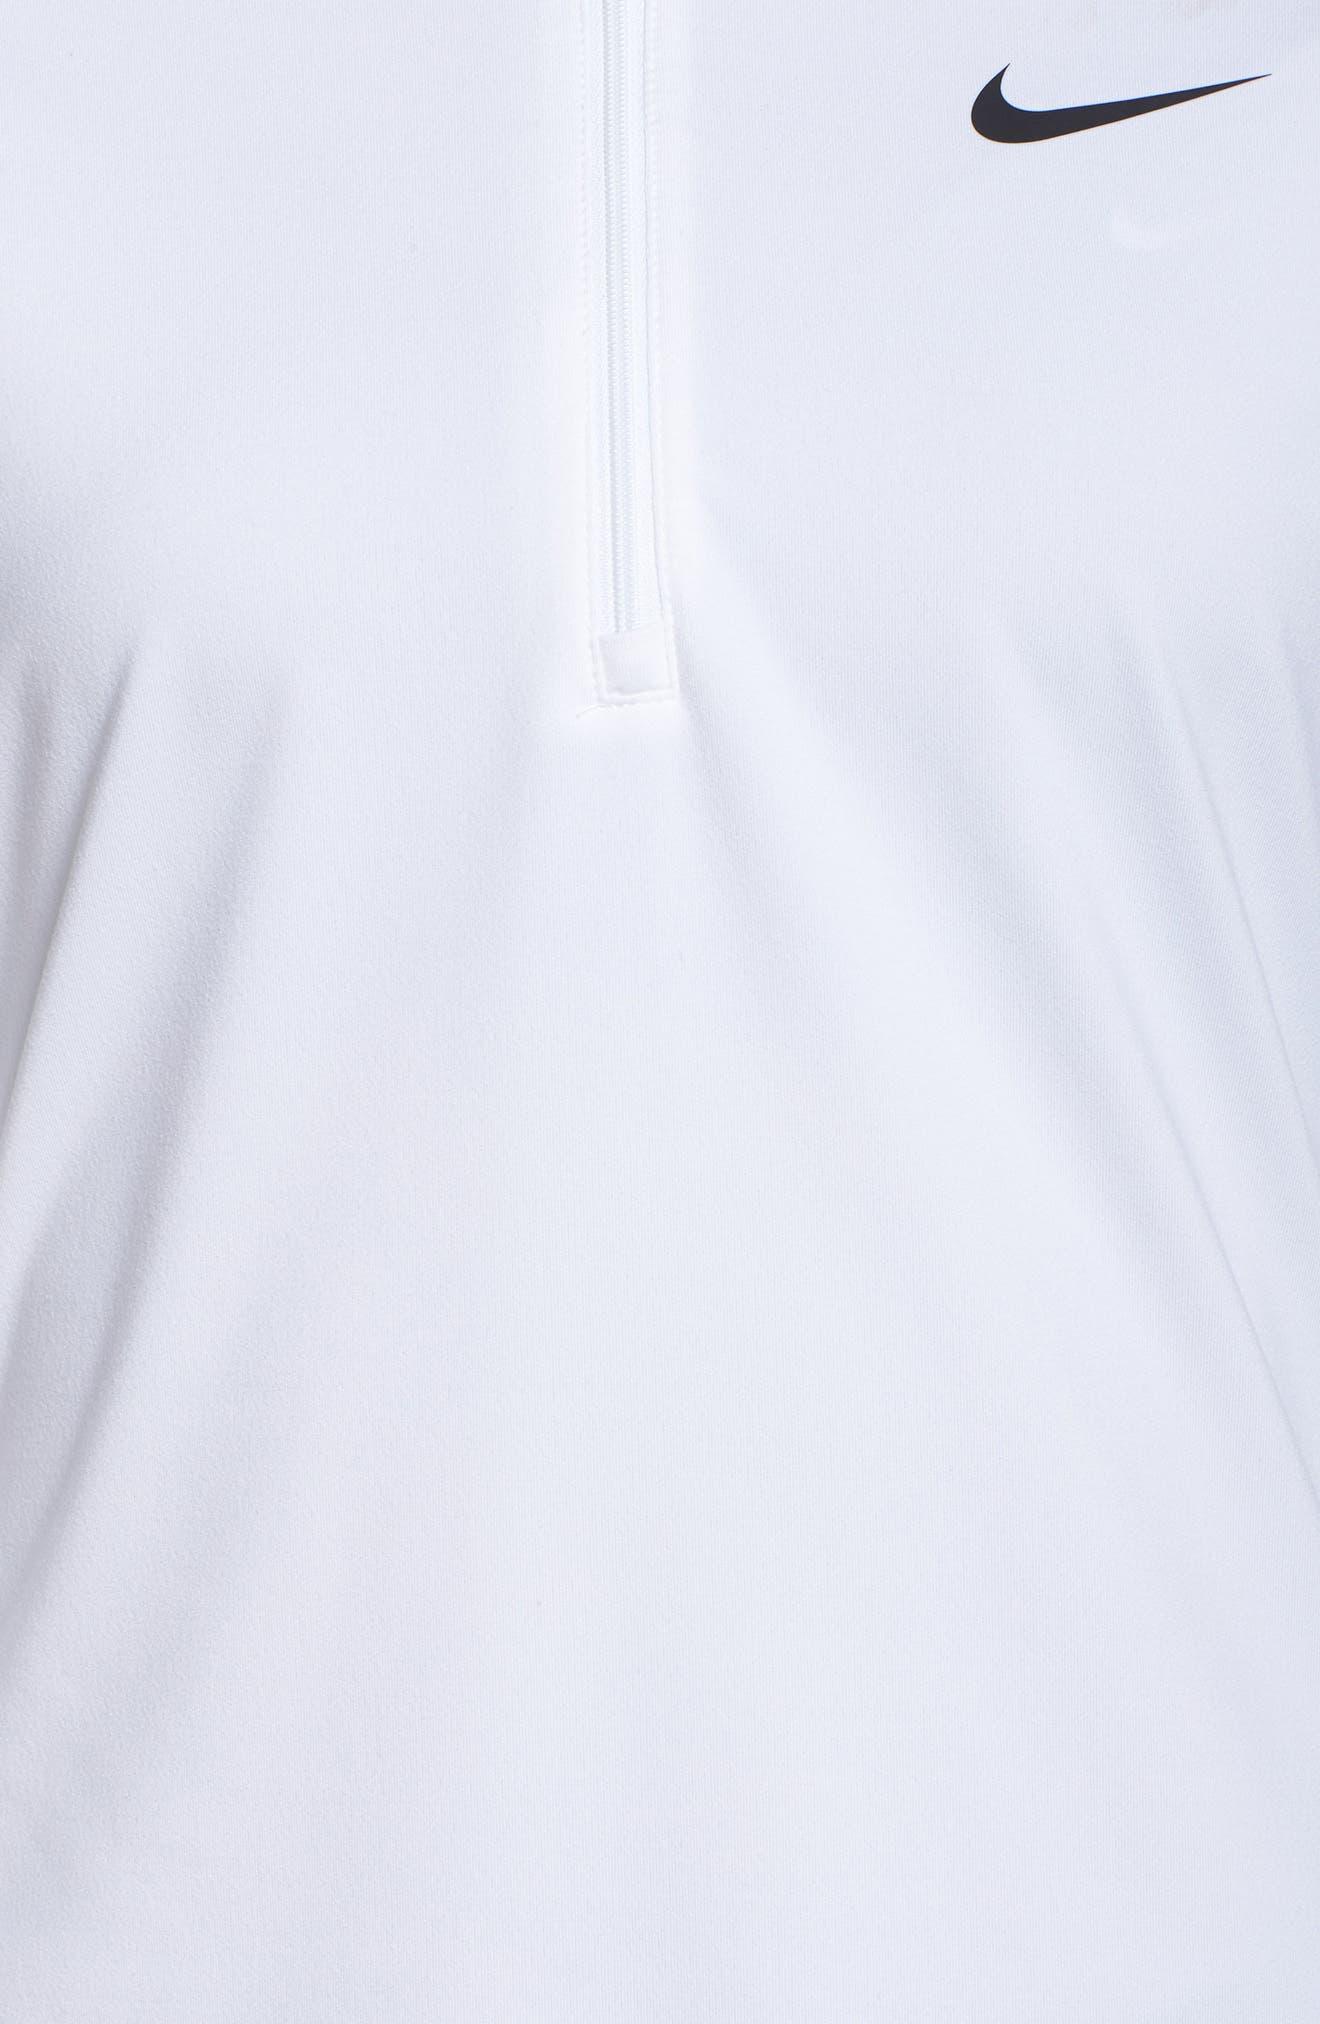 Court Pure Half Zip Tennis Top,                             Alternate thumbnail 6, color,                             White/ Black